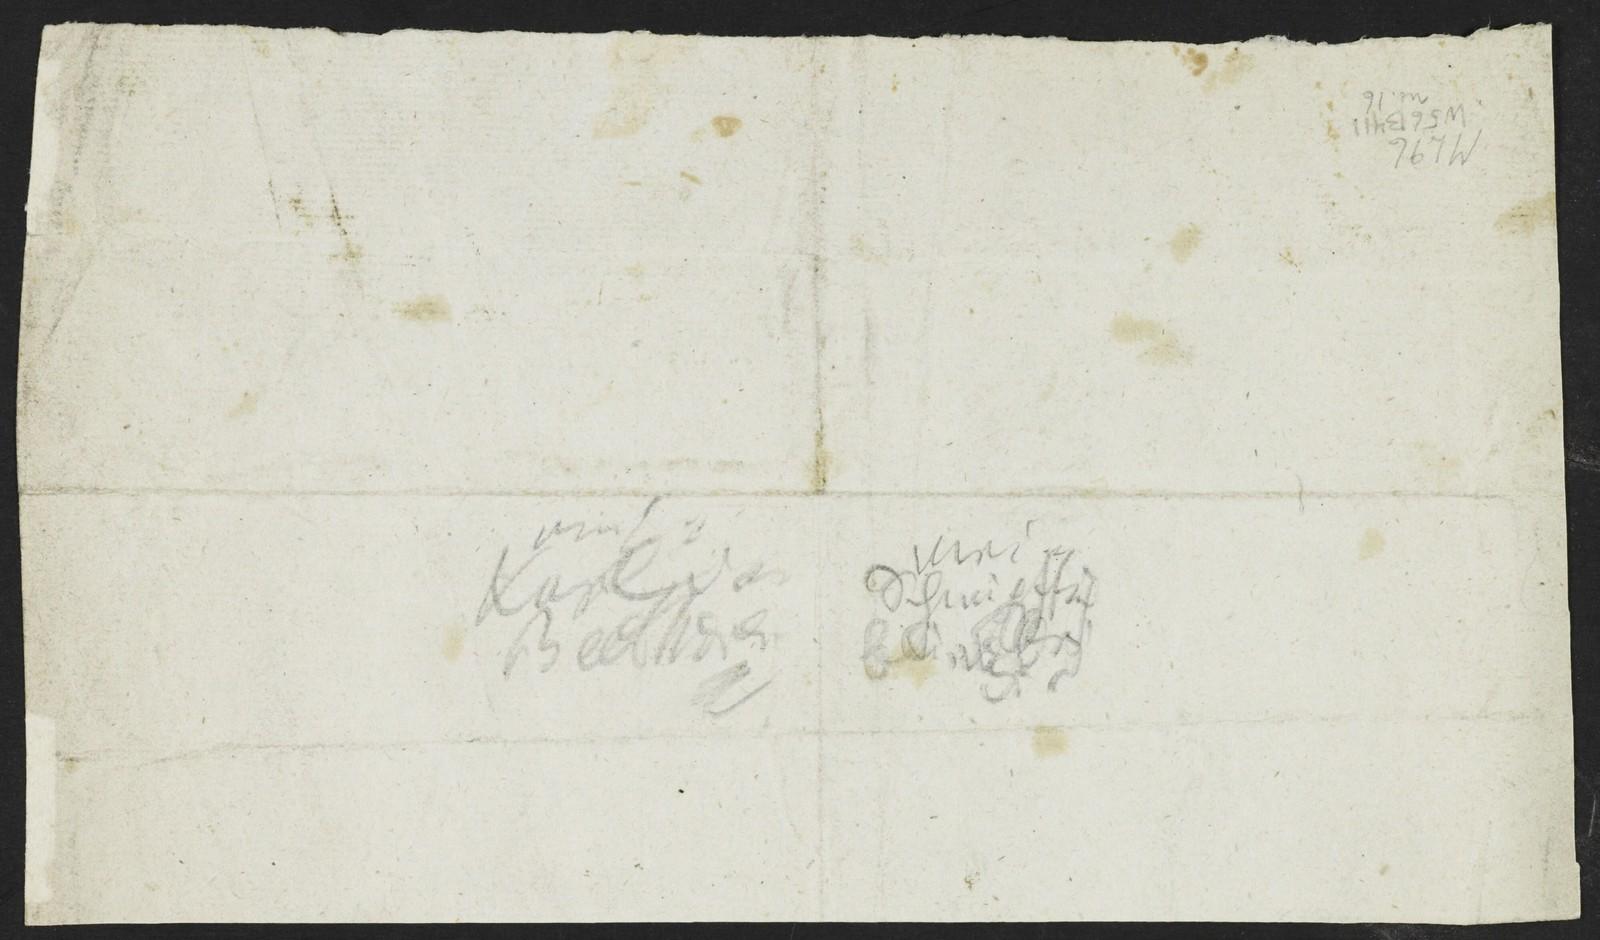 Ludwig van Beethoven autograph letter to Karl van Beethoven, [1825] Aug. 31